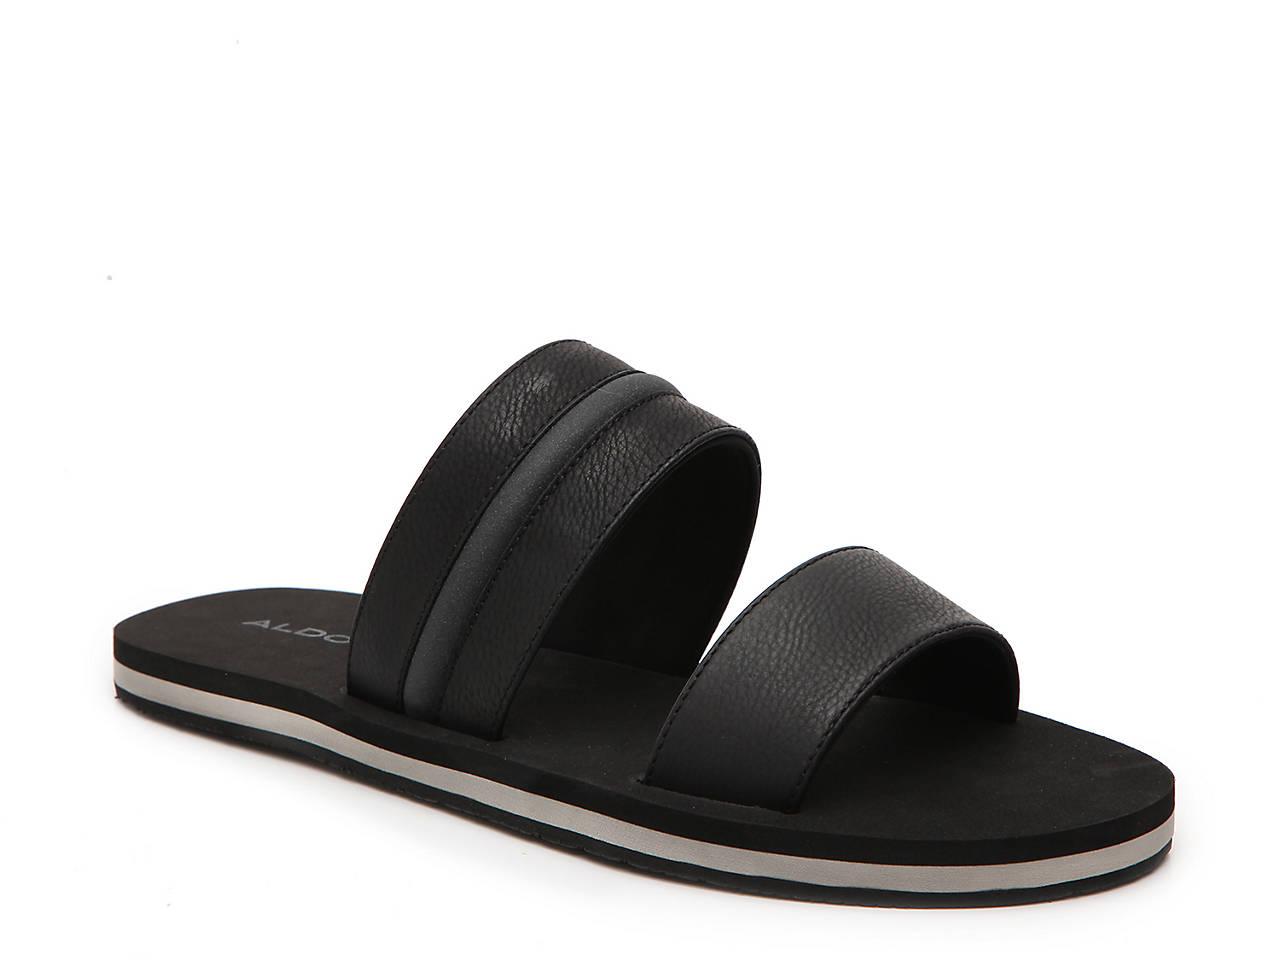 6022a841f Aldo Ariadda Sandal Men s Shoes